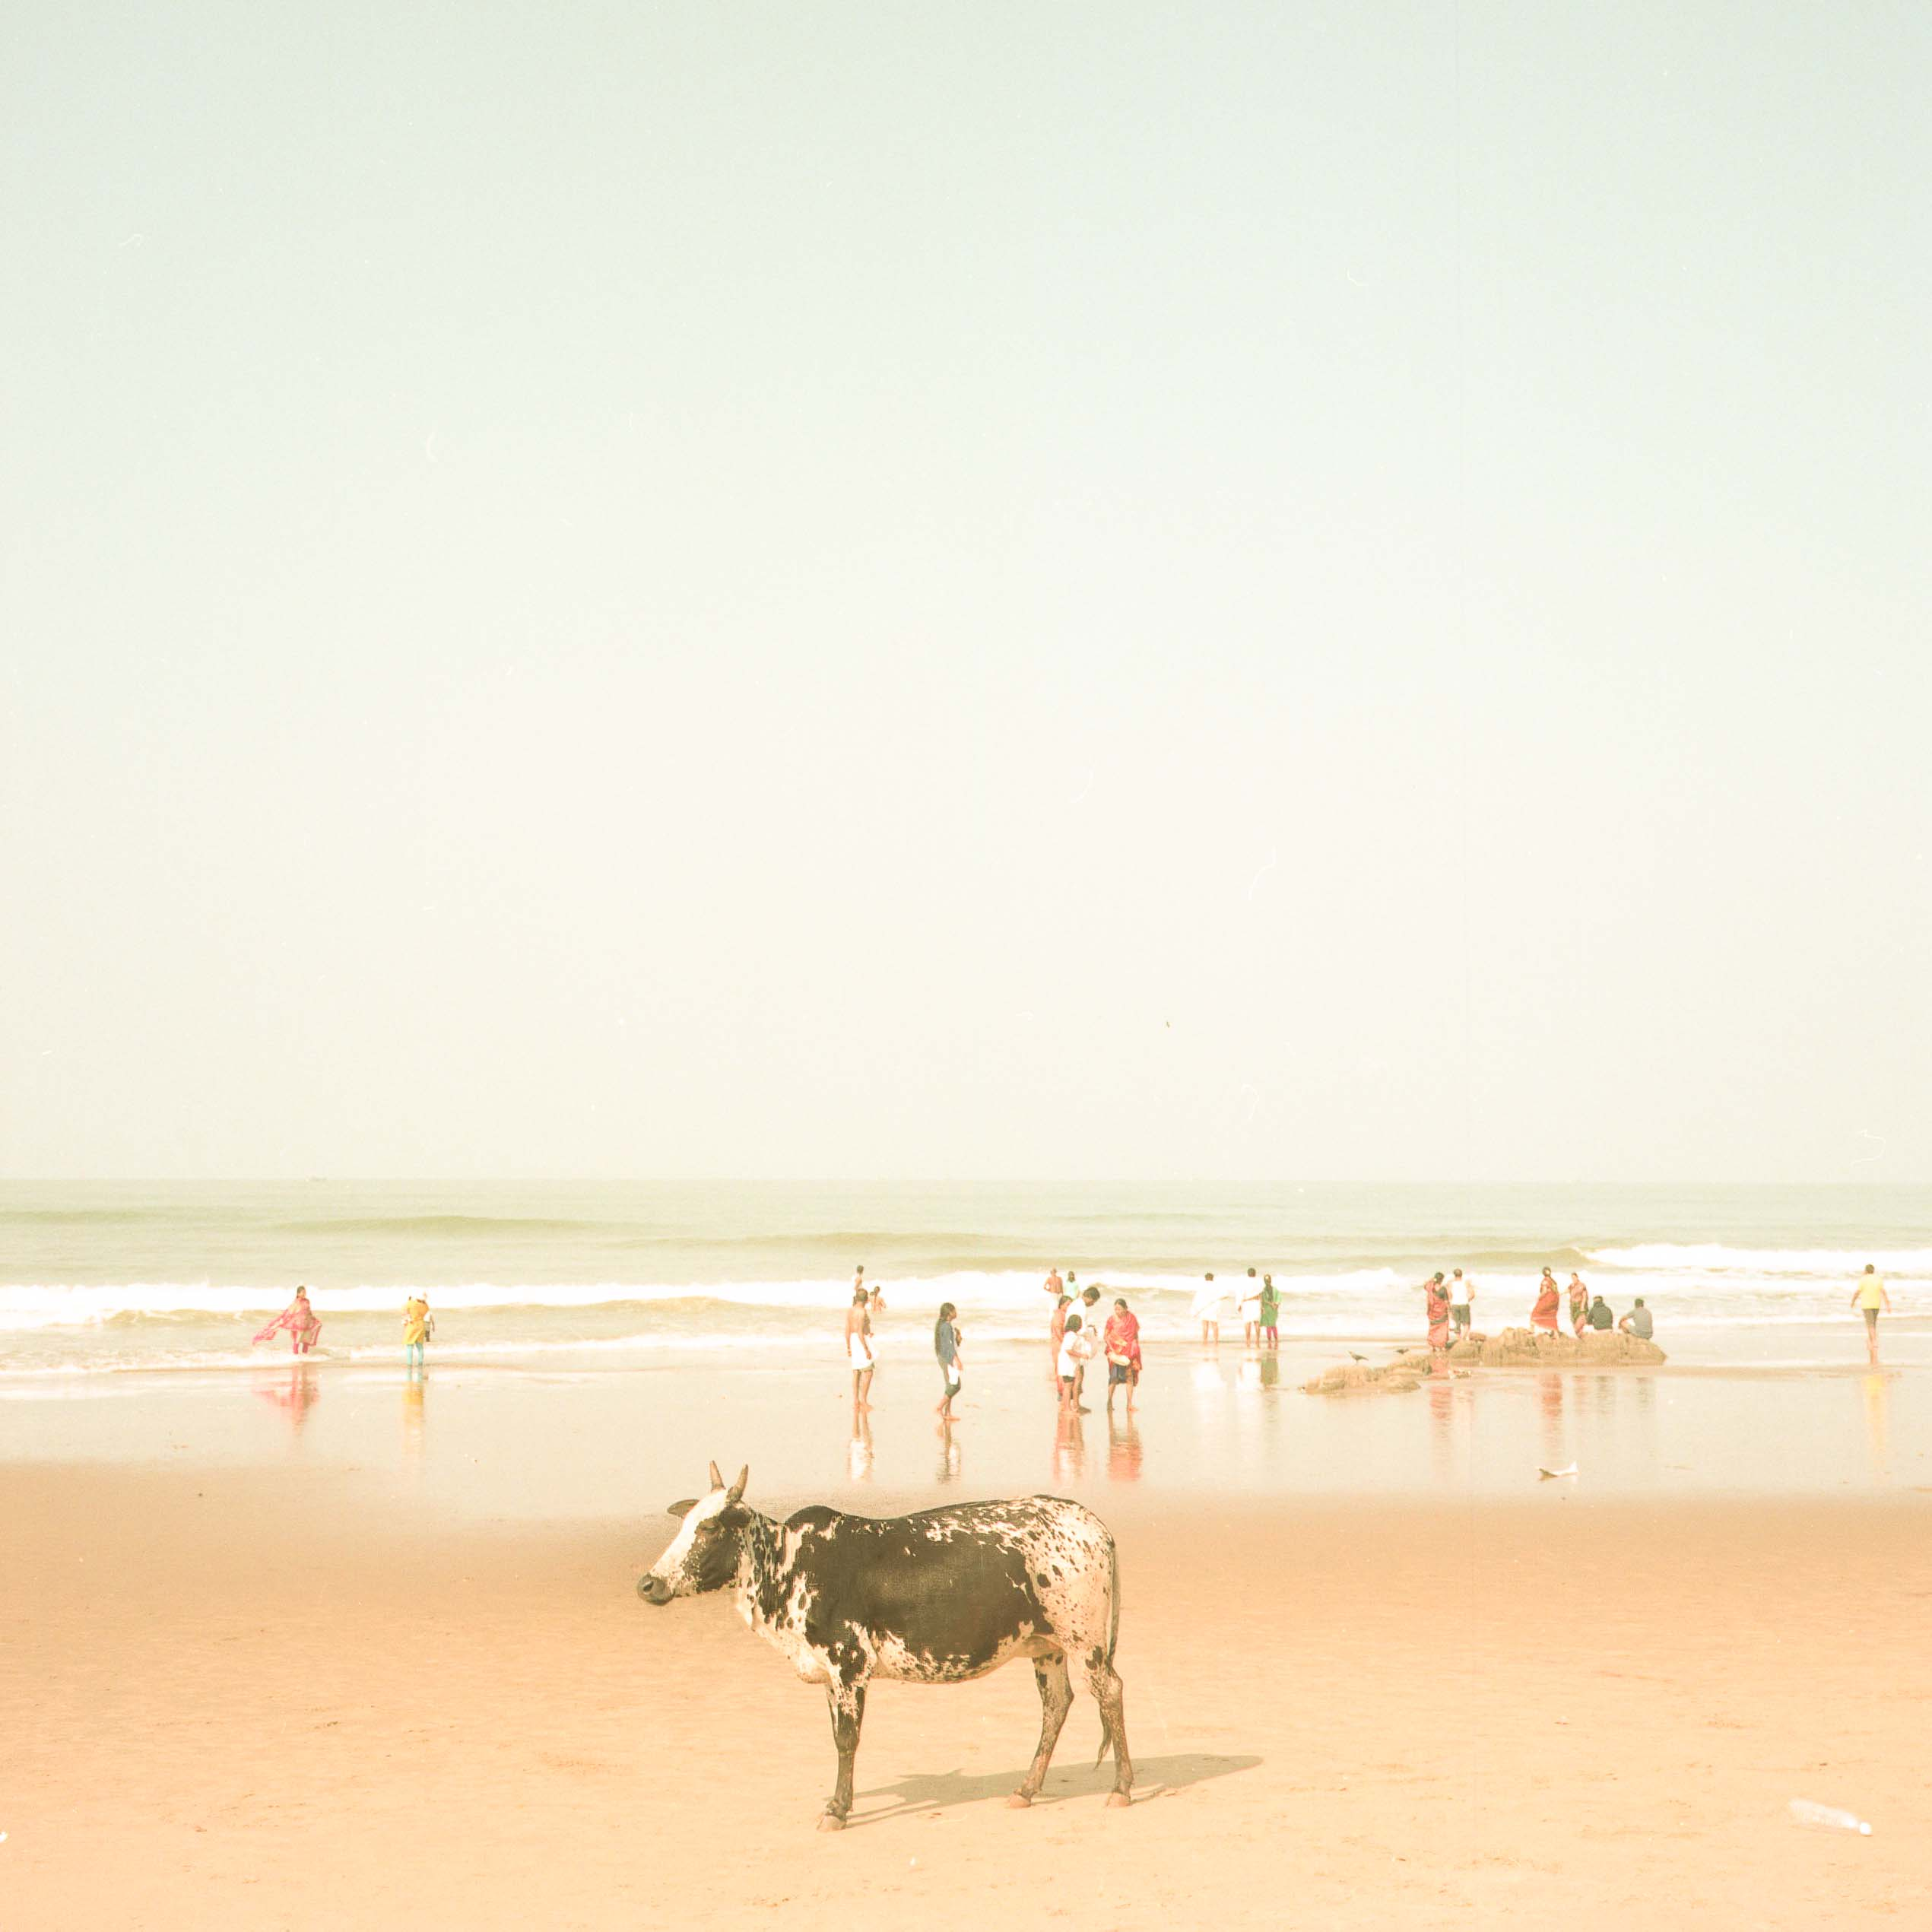 Cow at the beach, Gokarna , India 2018,cow at the beach, India, fine art photograph, seascape, travel photography, fotografo, film photography, raffaele ferrari photography